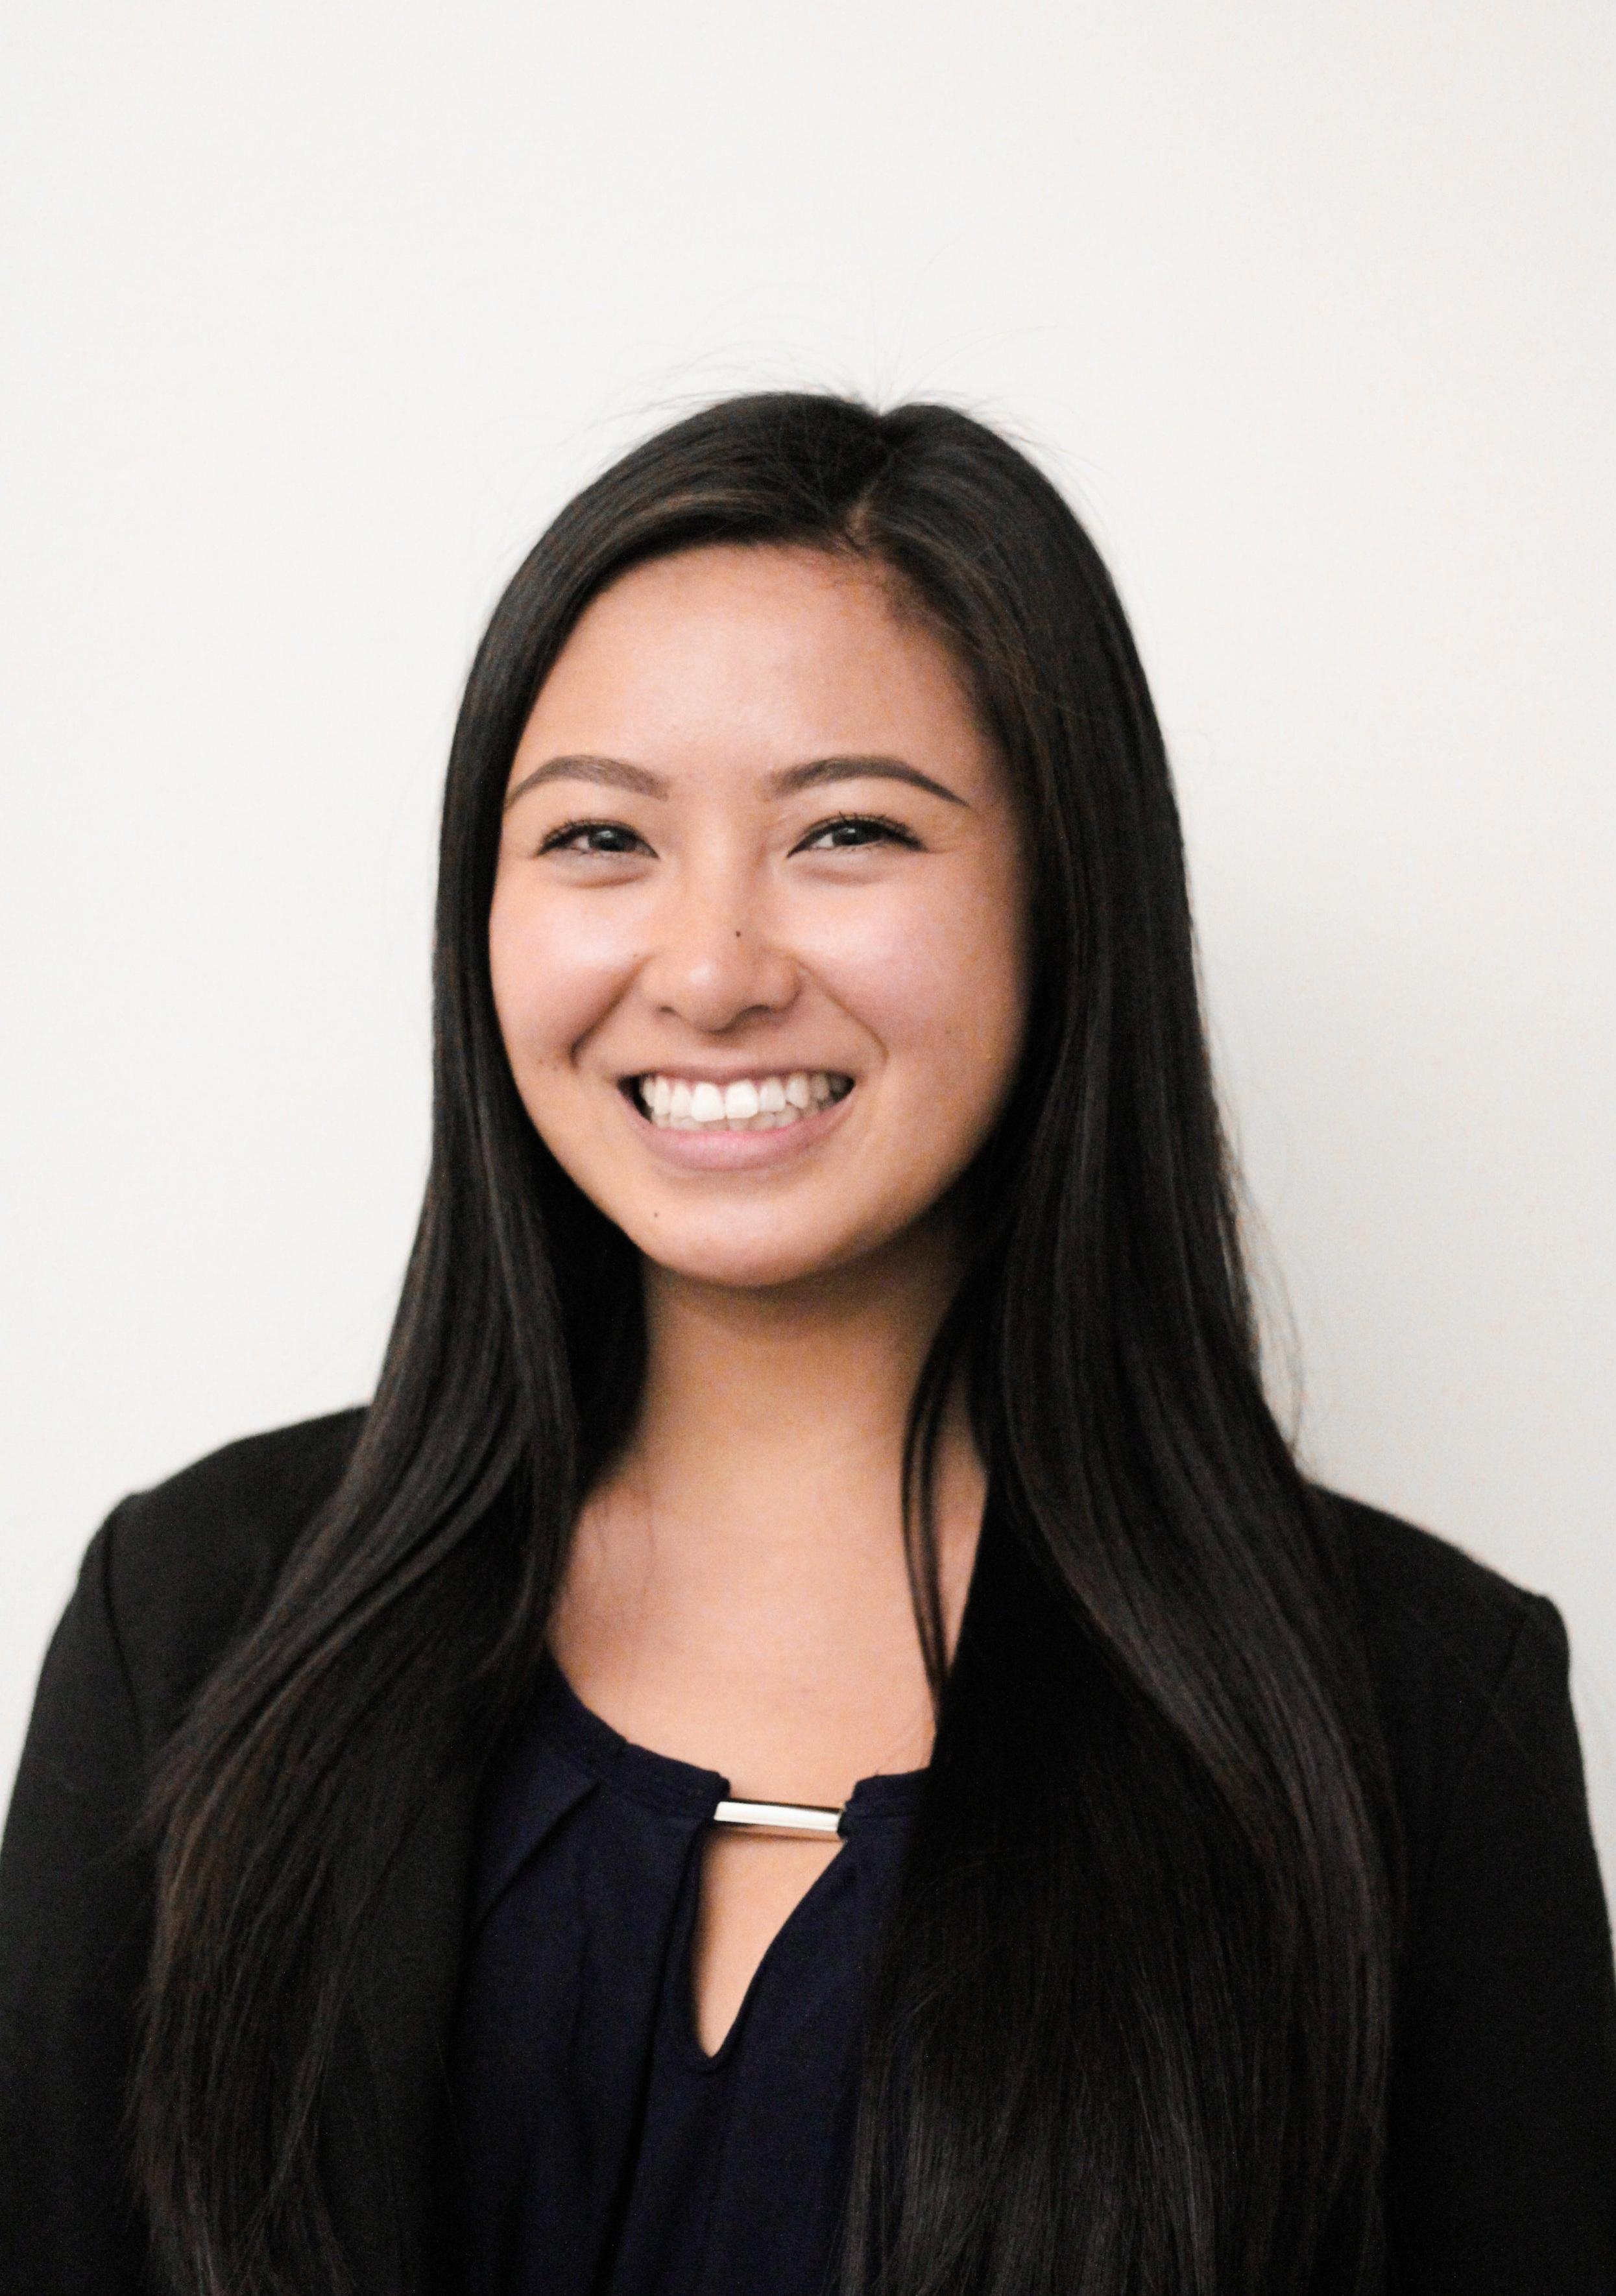 Janine Bautista - 2020 | Major: Marketing